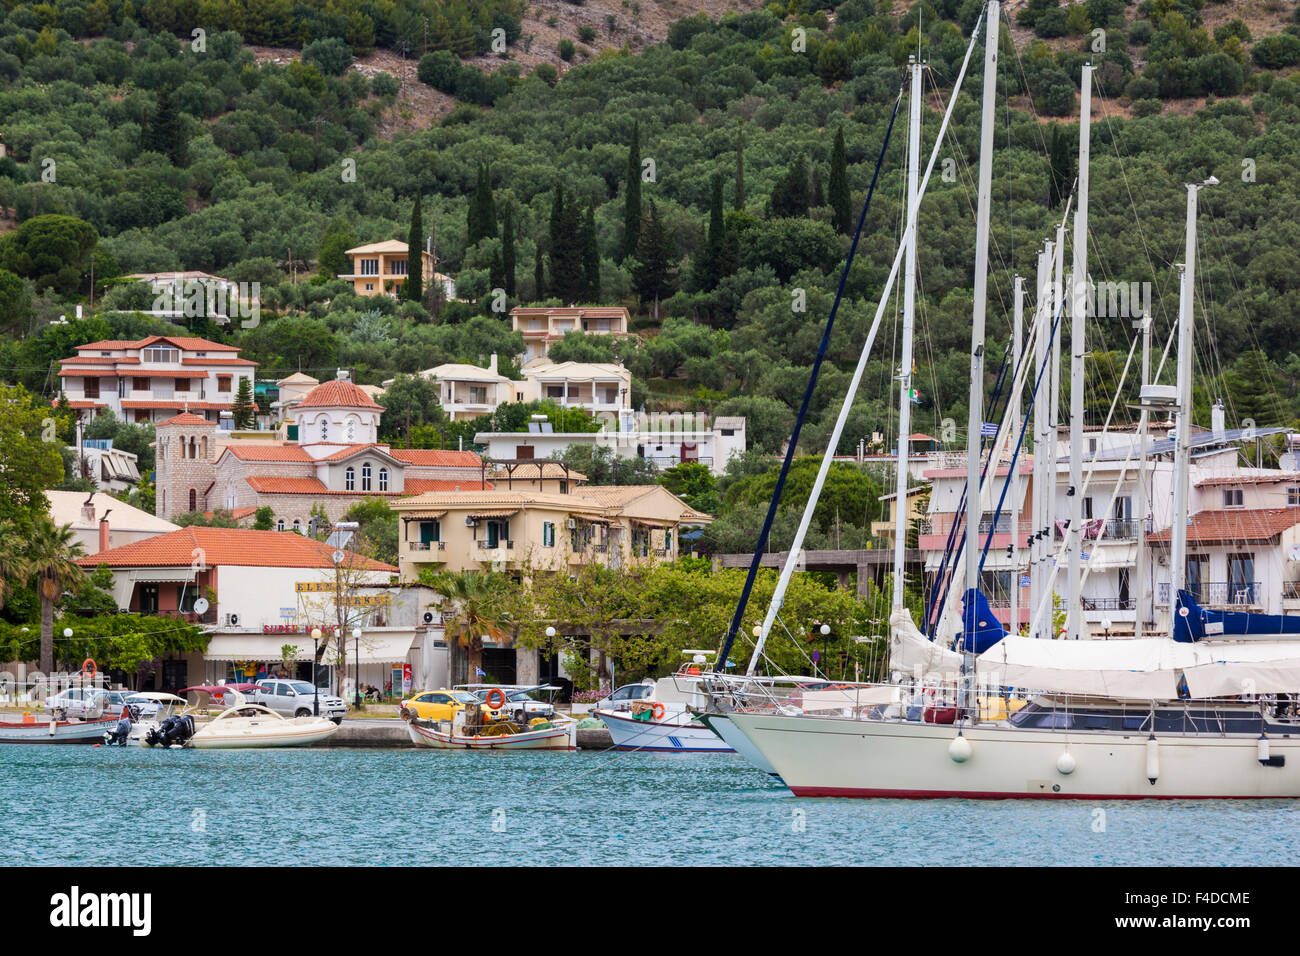 Greece, Epirus, Plataria, small Ionian Sea resort, harbor view - Stock Image